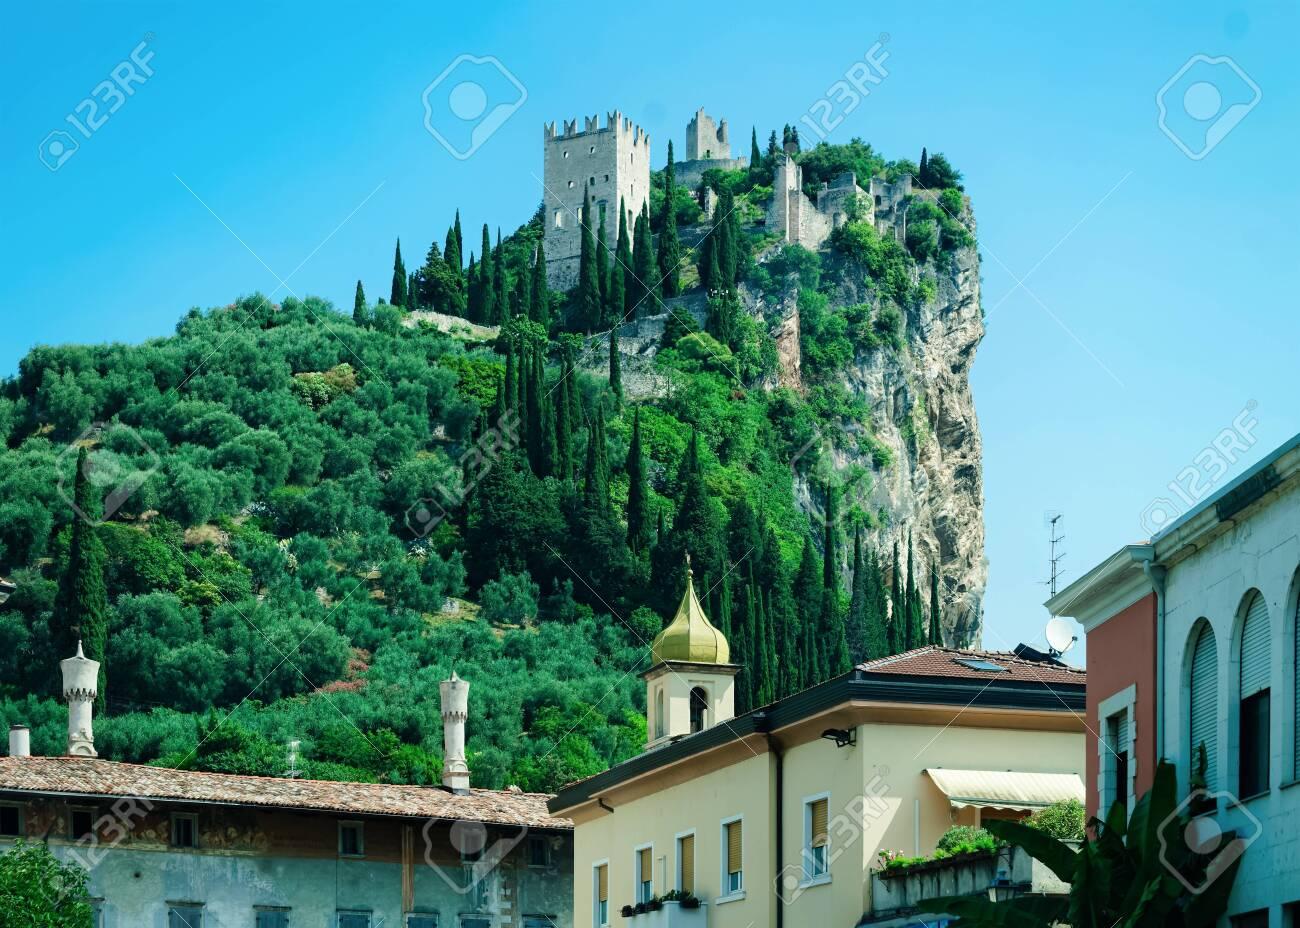 Landscape with Castello di Arco on rock at Garda lake - 137425272